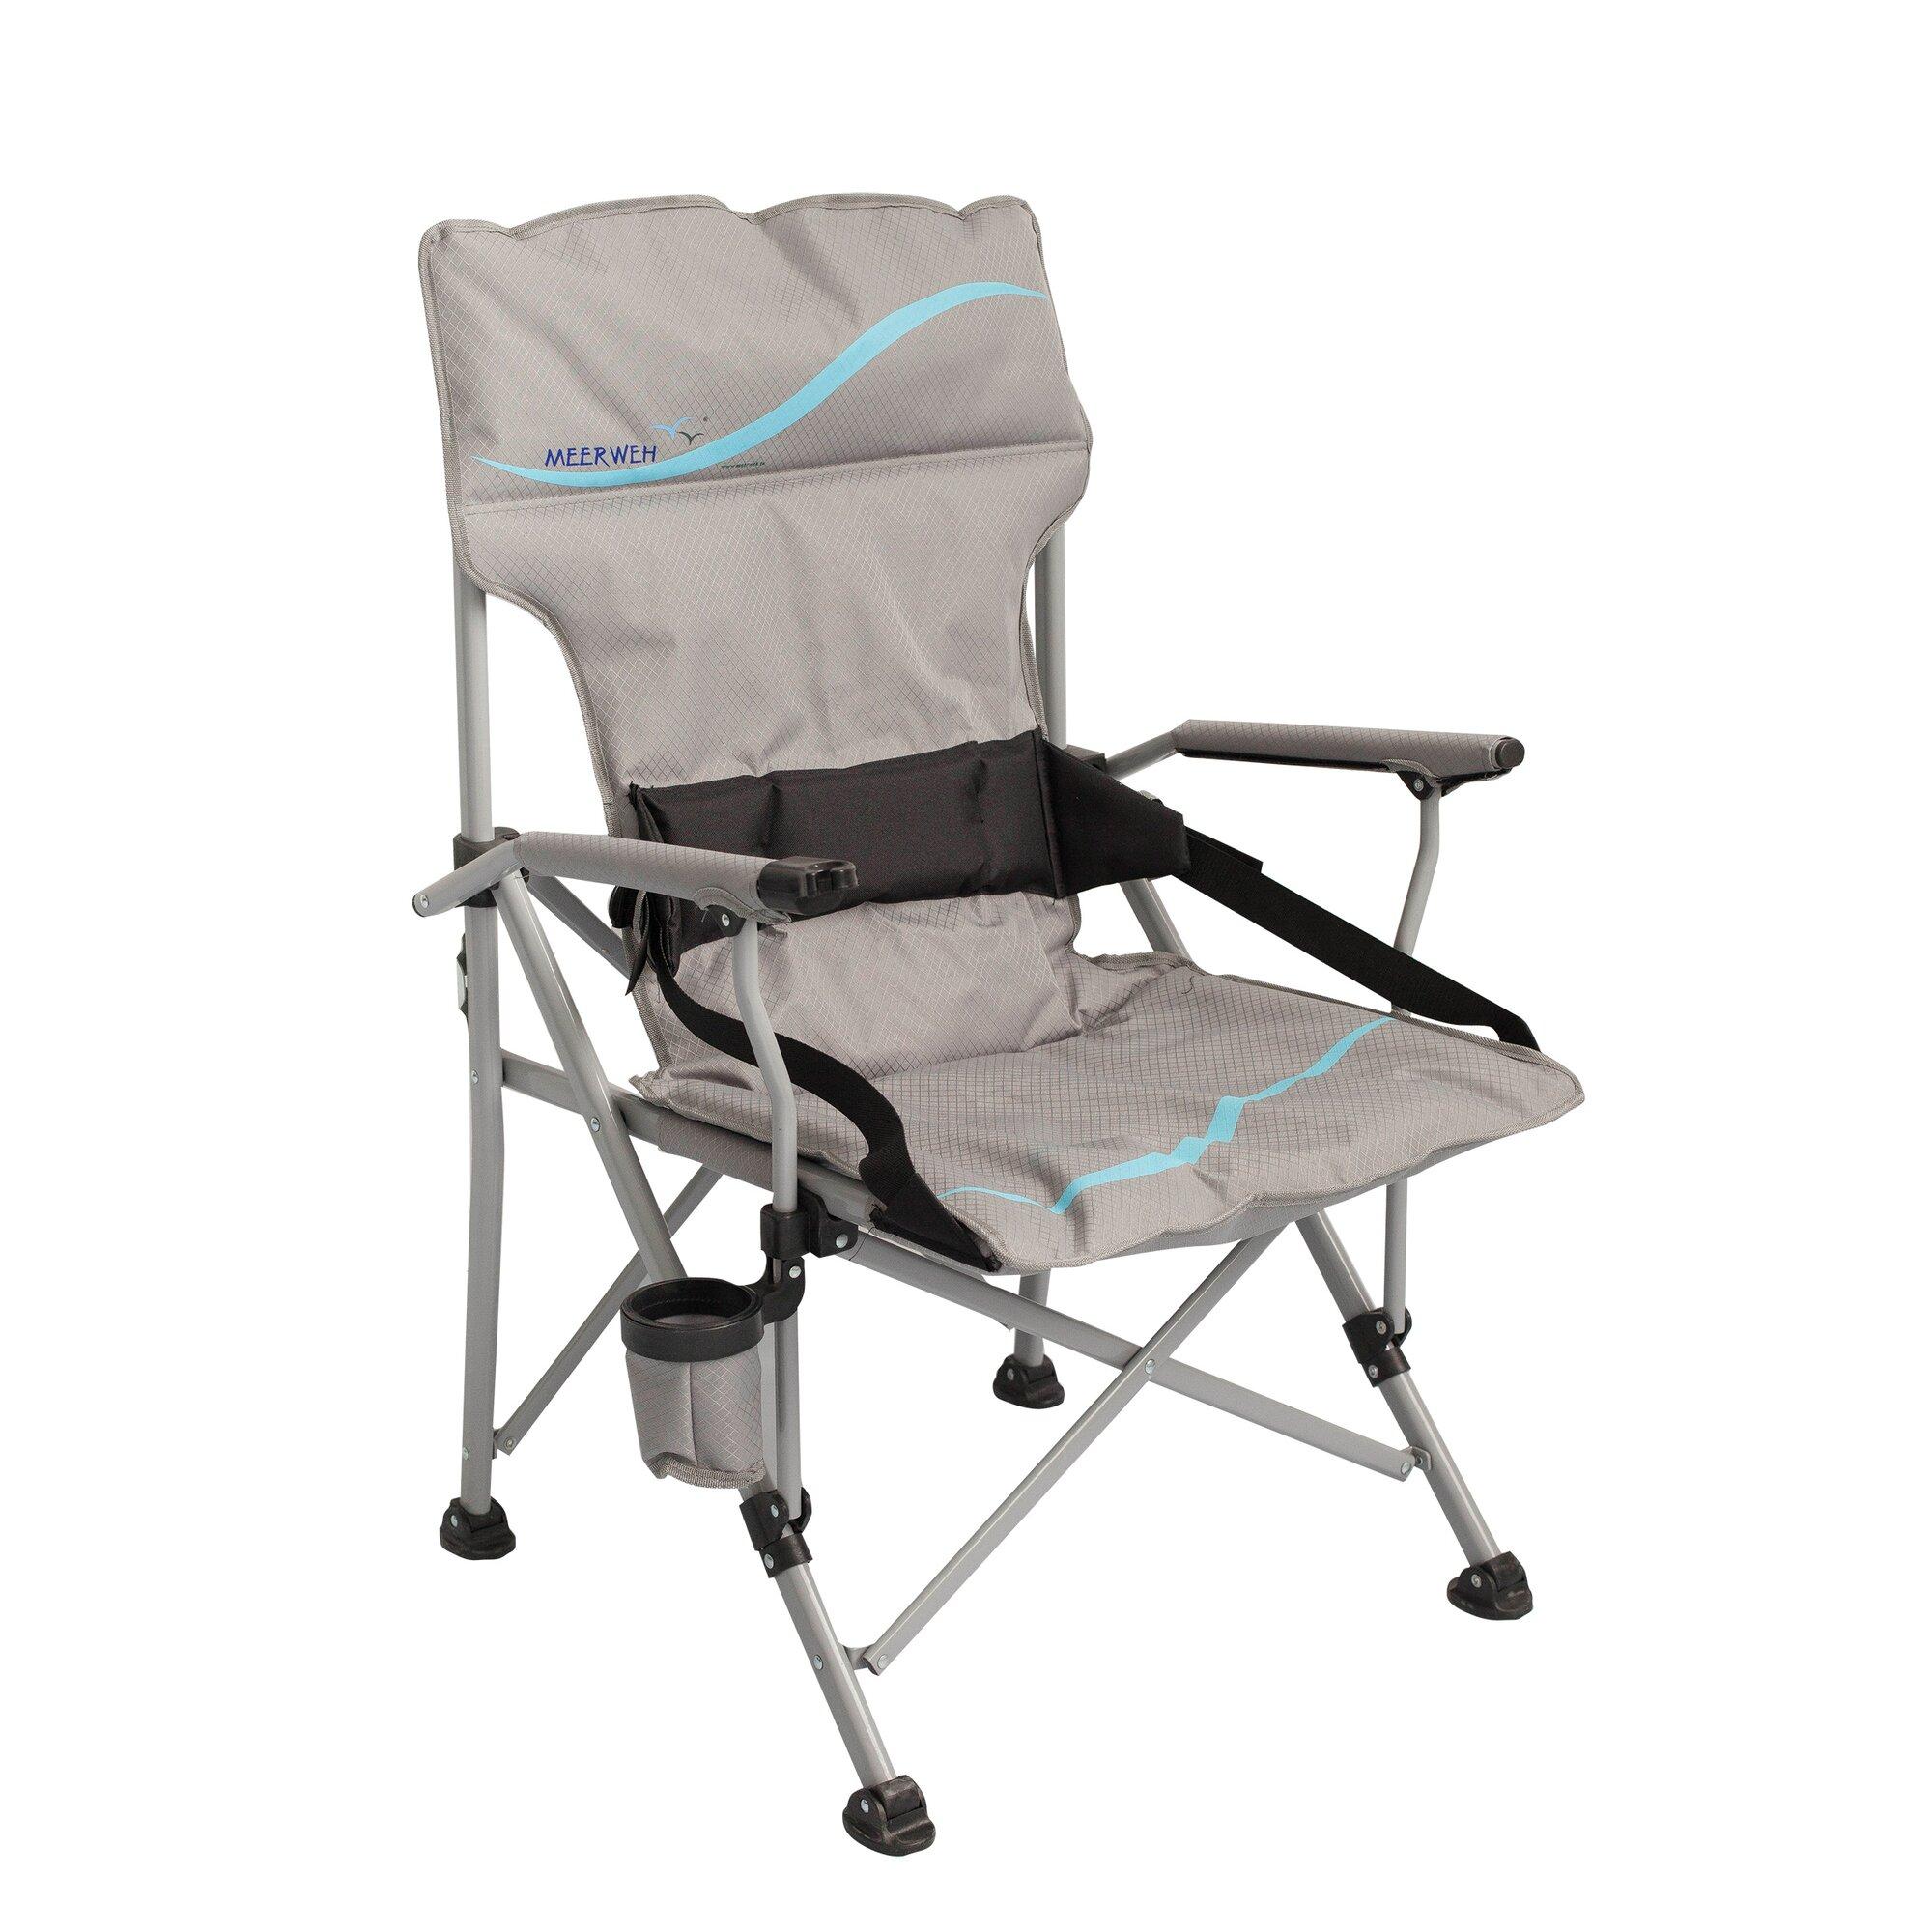 caracella campingstuhl meerweh mit getr nkehalter. Black Bedroom Furniture Sets. Home Design Ideas